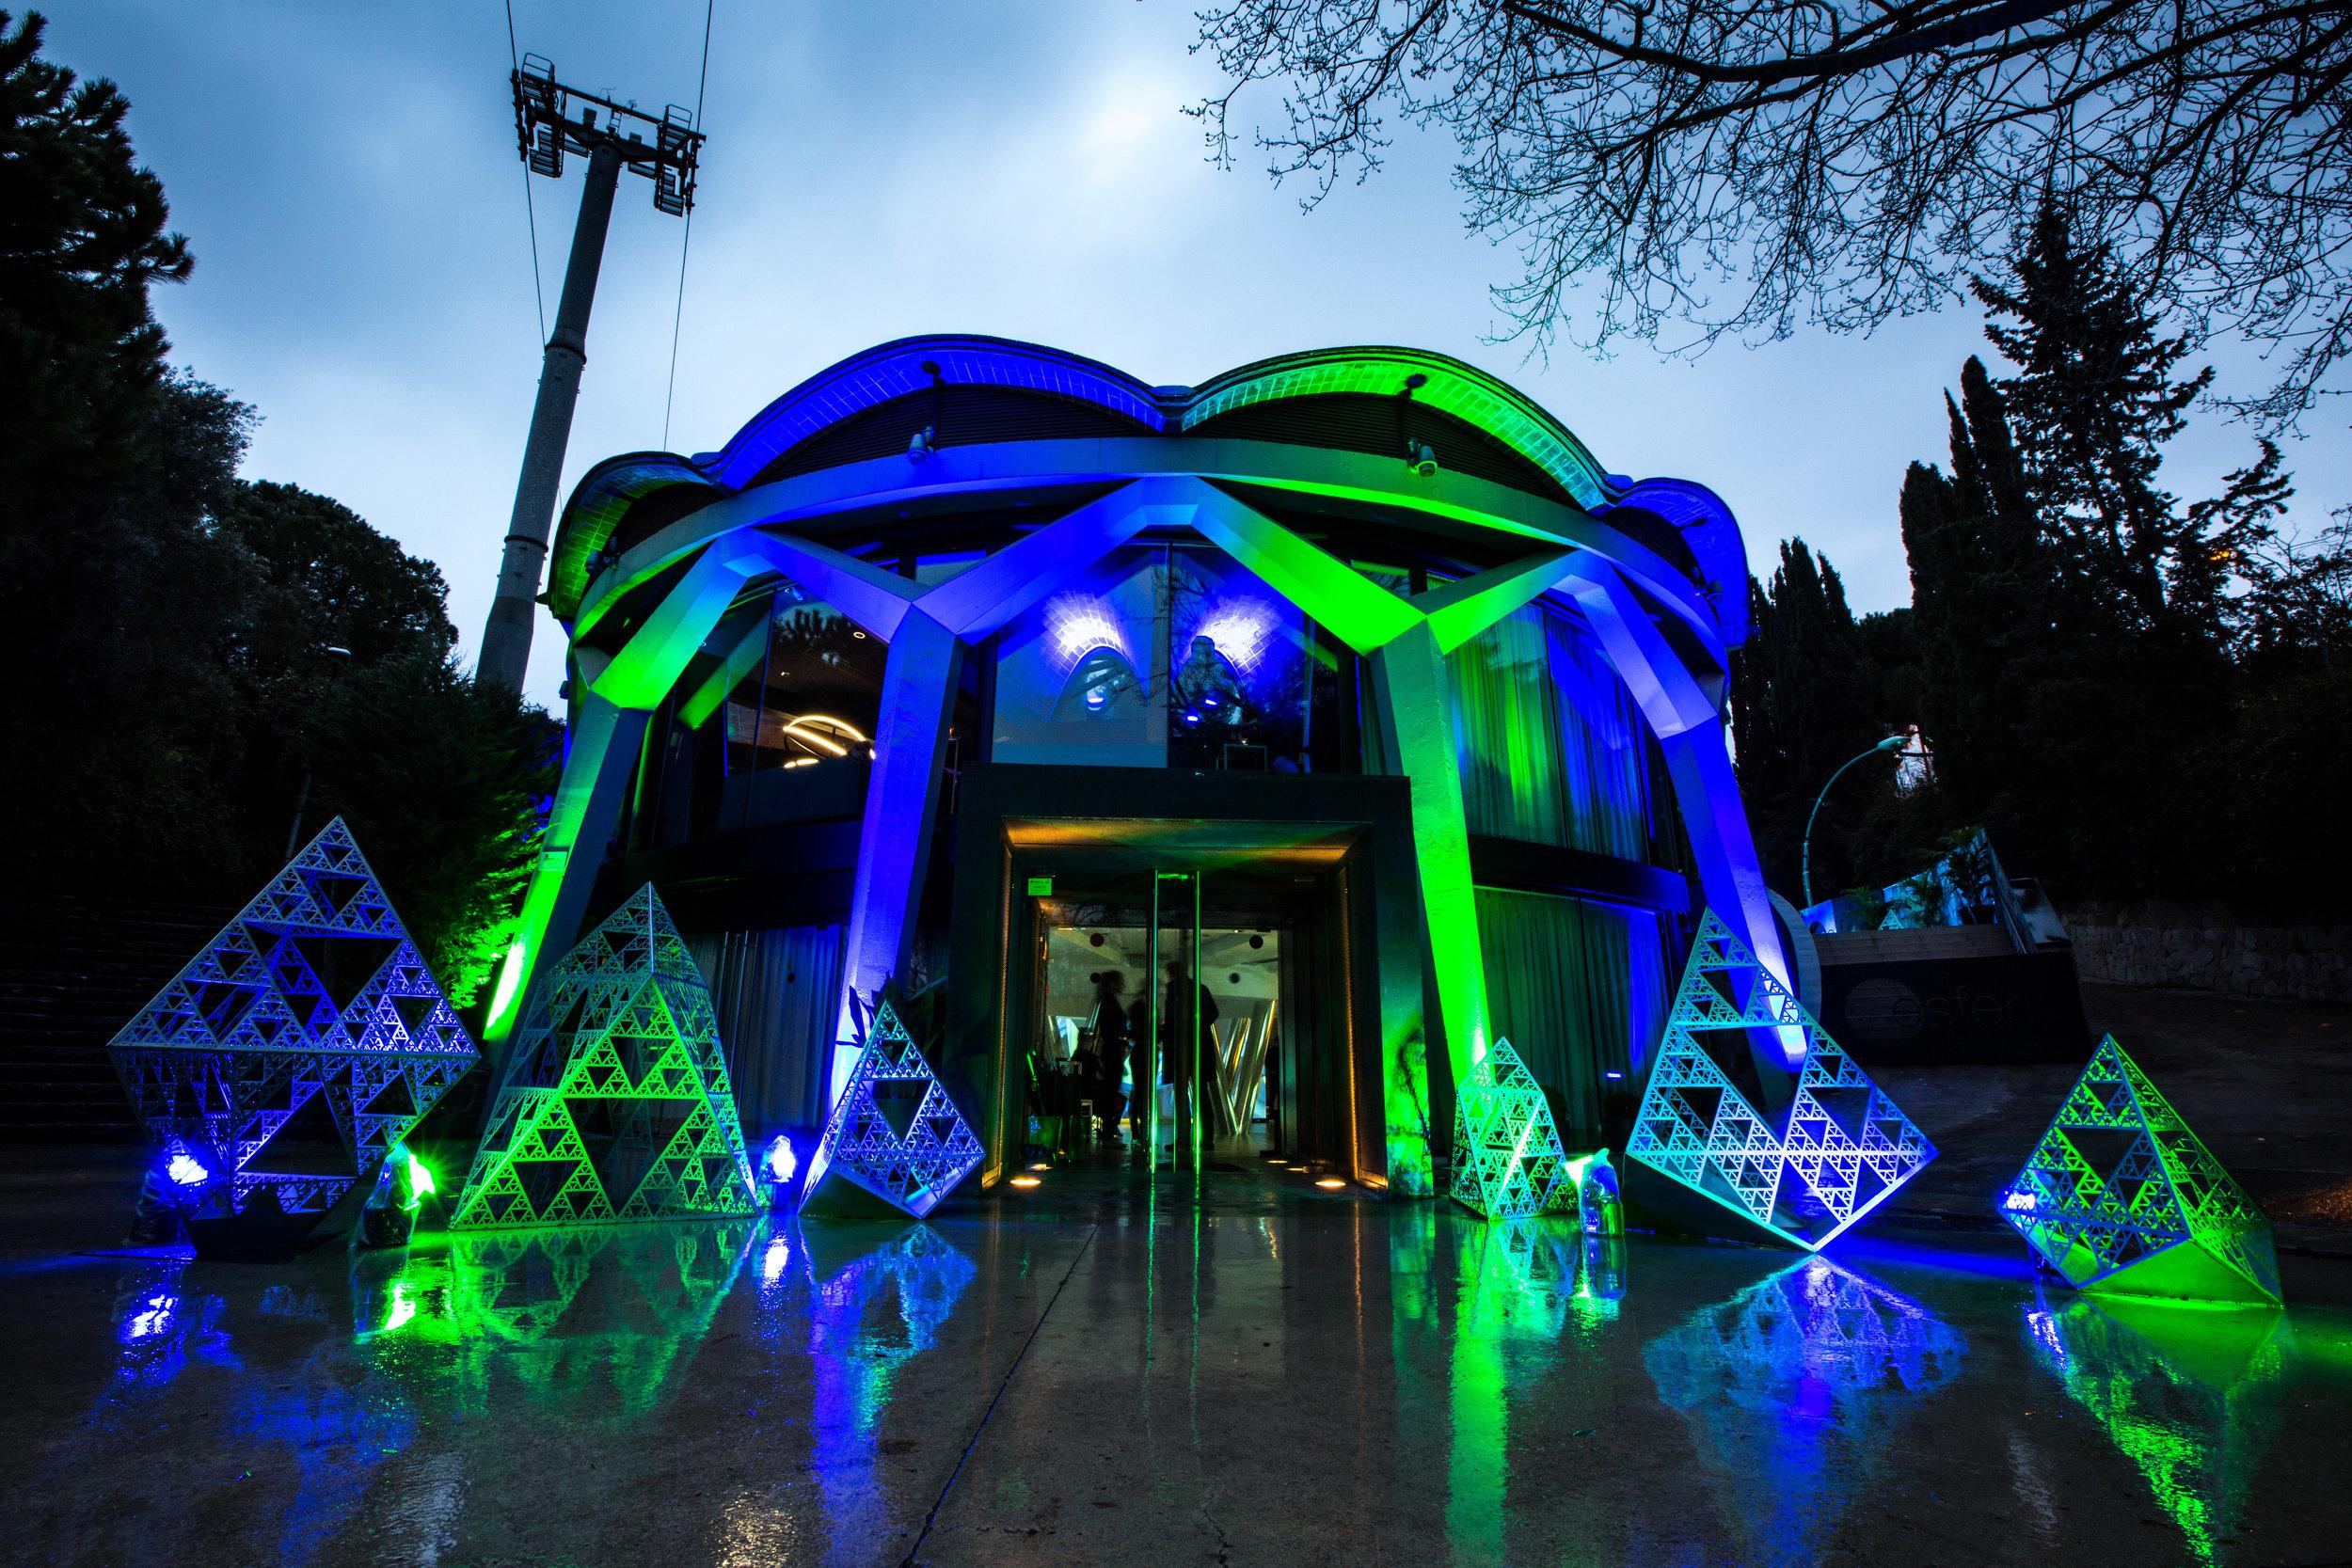 Entrance to immersive light installation